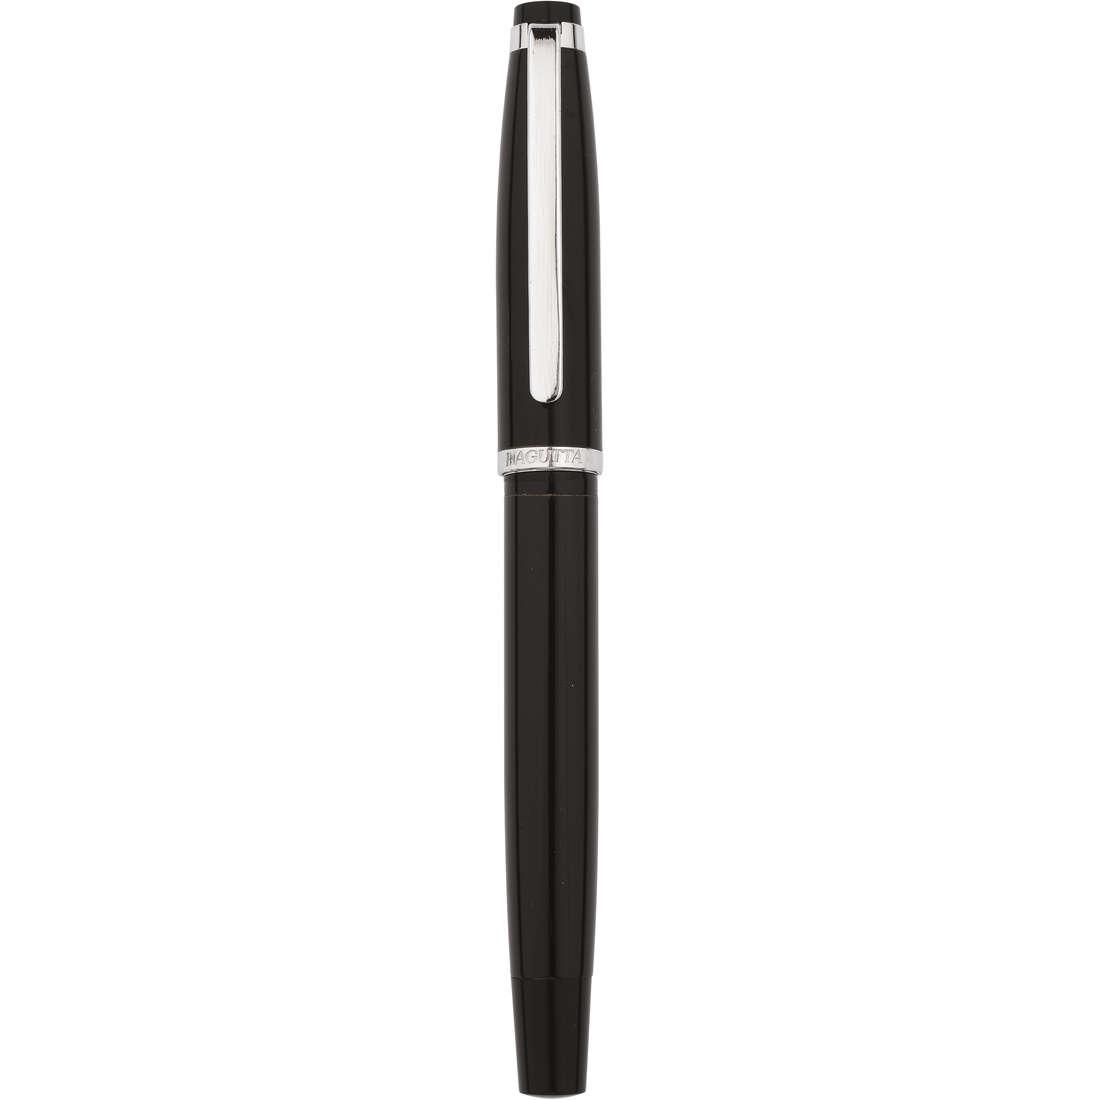 penna unisex gioielli Bagutta Penne H 6000-02 R